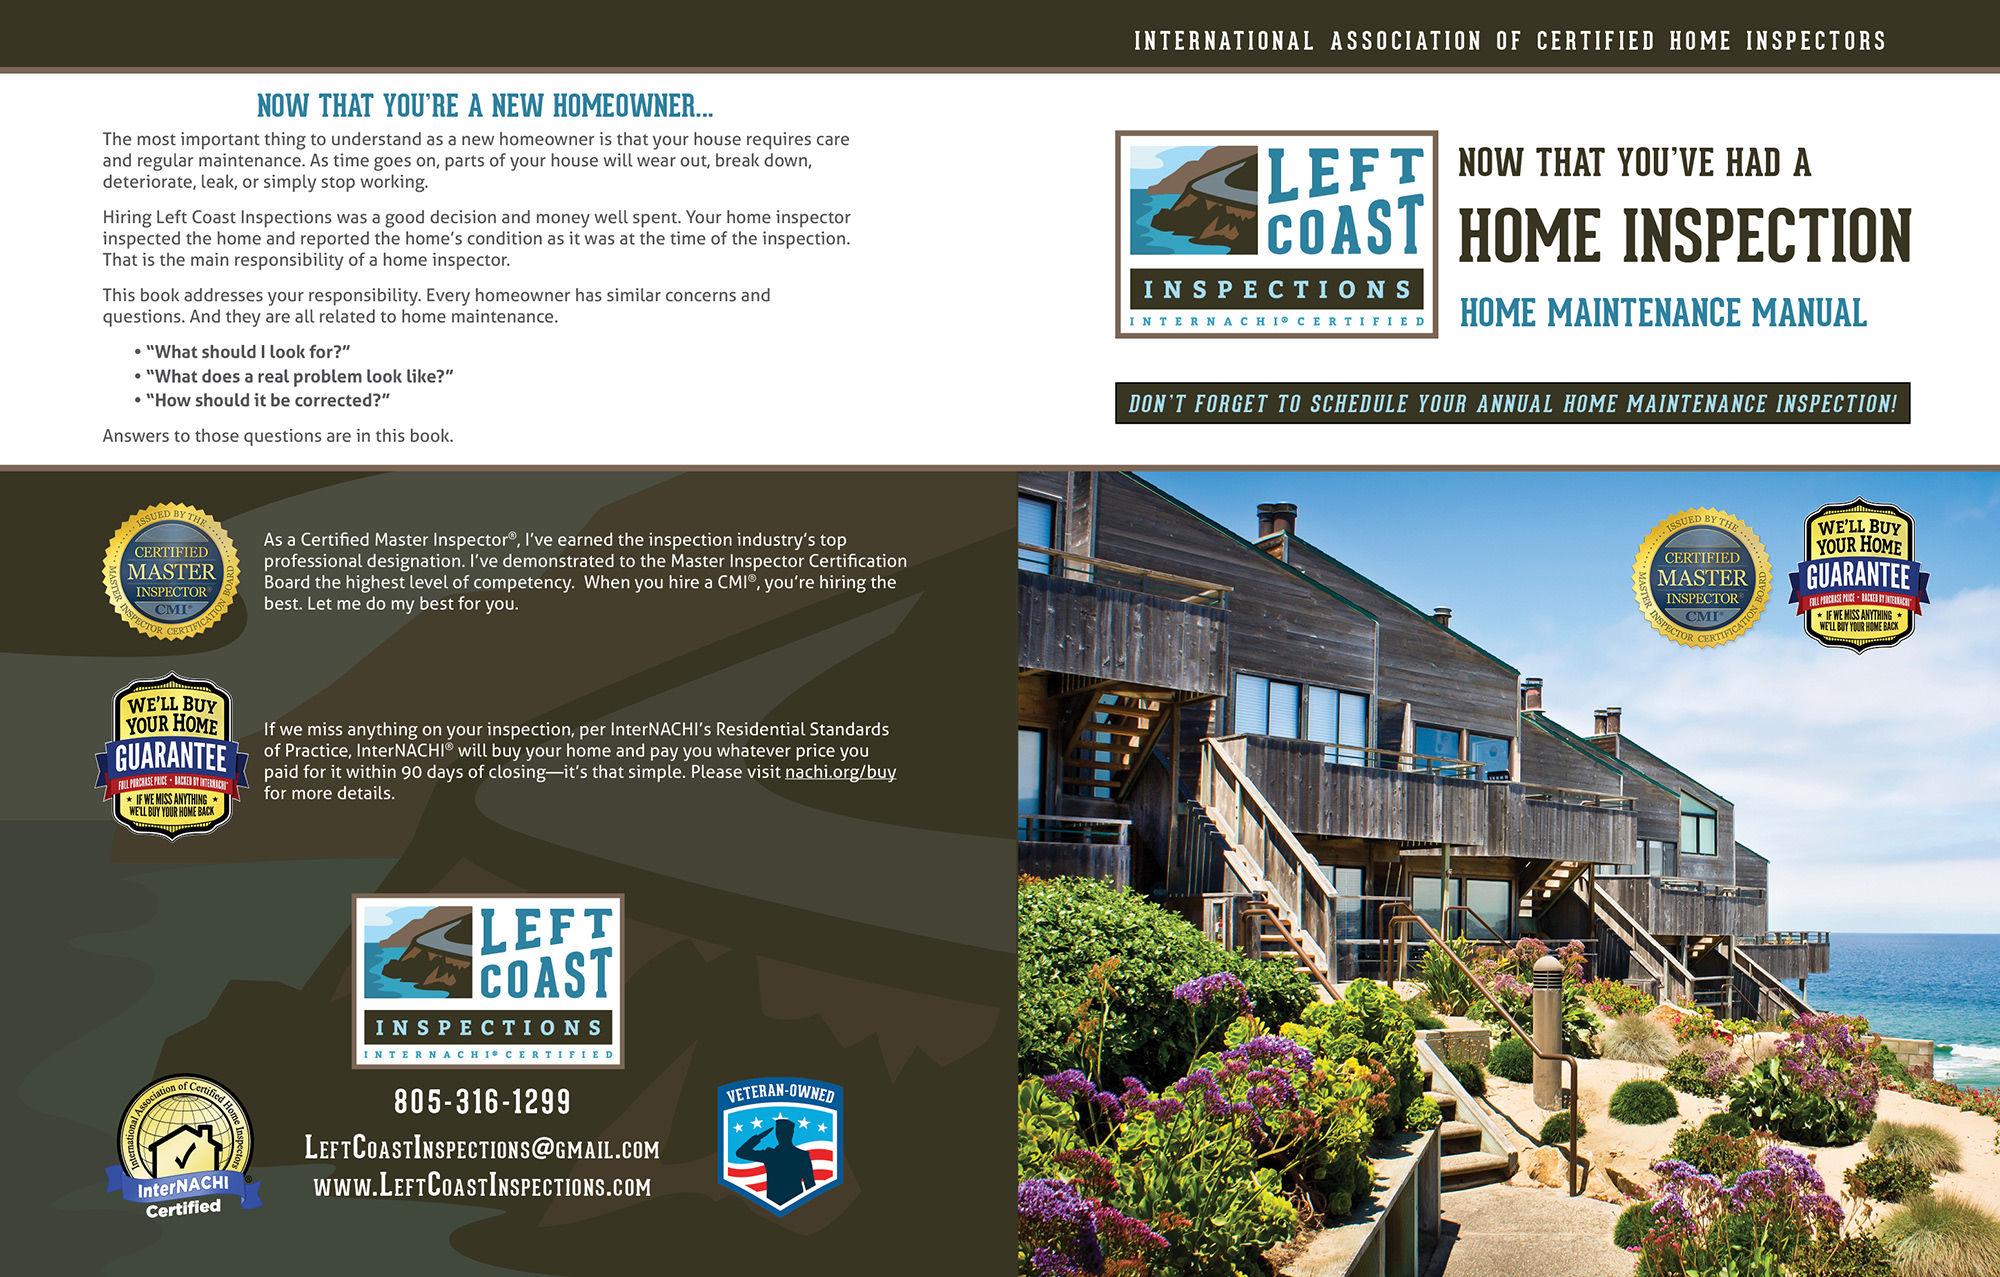 Custom Home Maintenance Book for Left Coast Inspections